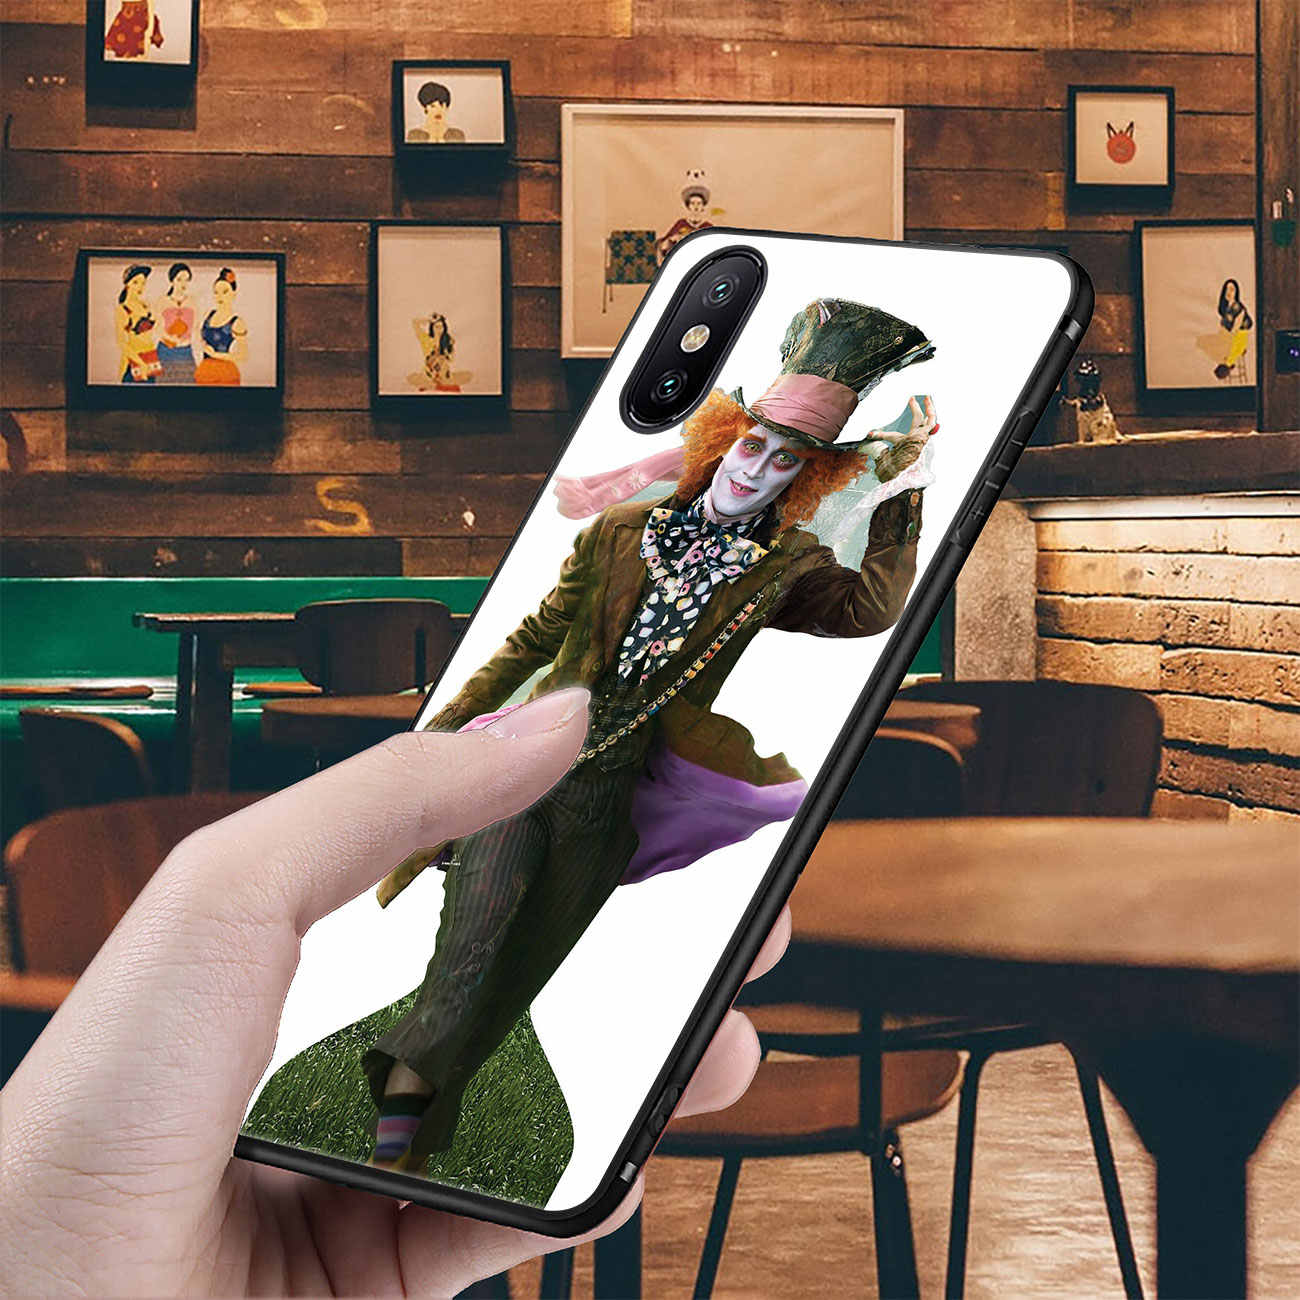 YIMAOC johnny depp ซิลิโคนสำหรับ iPhone 11 Pro XS Max XR X 6 6S 7 8 plus 5 5S SE 10 TPU ฝาครอบดอกไม้สีดำ